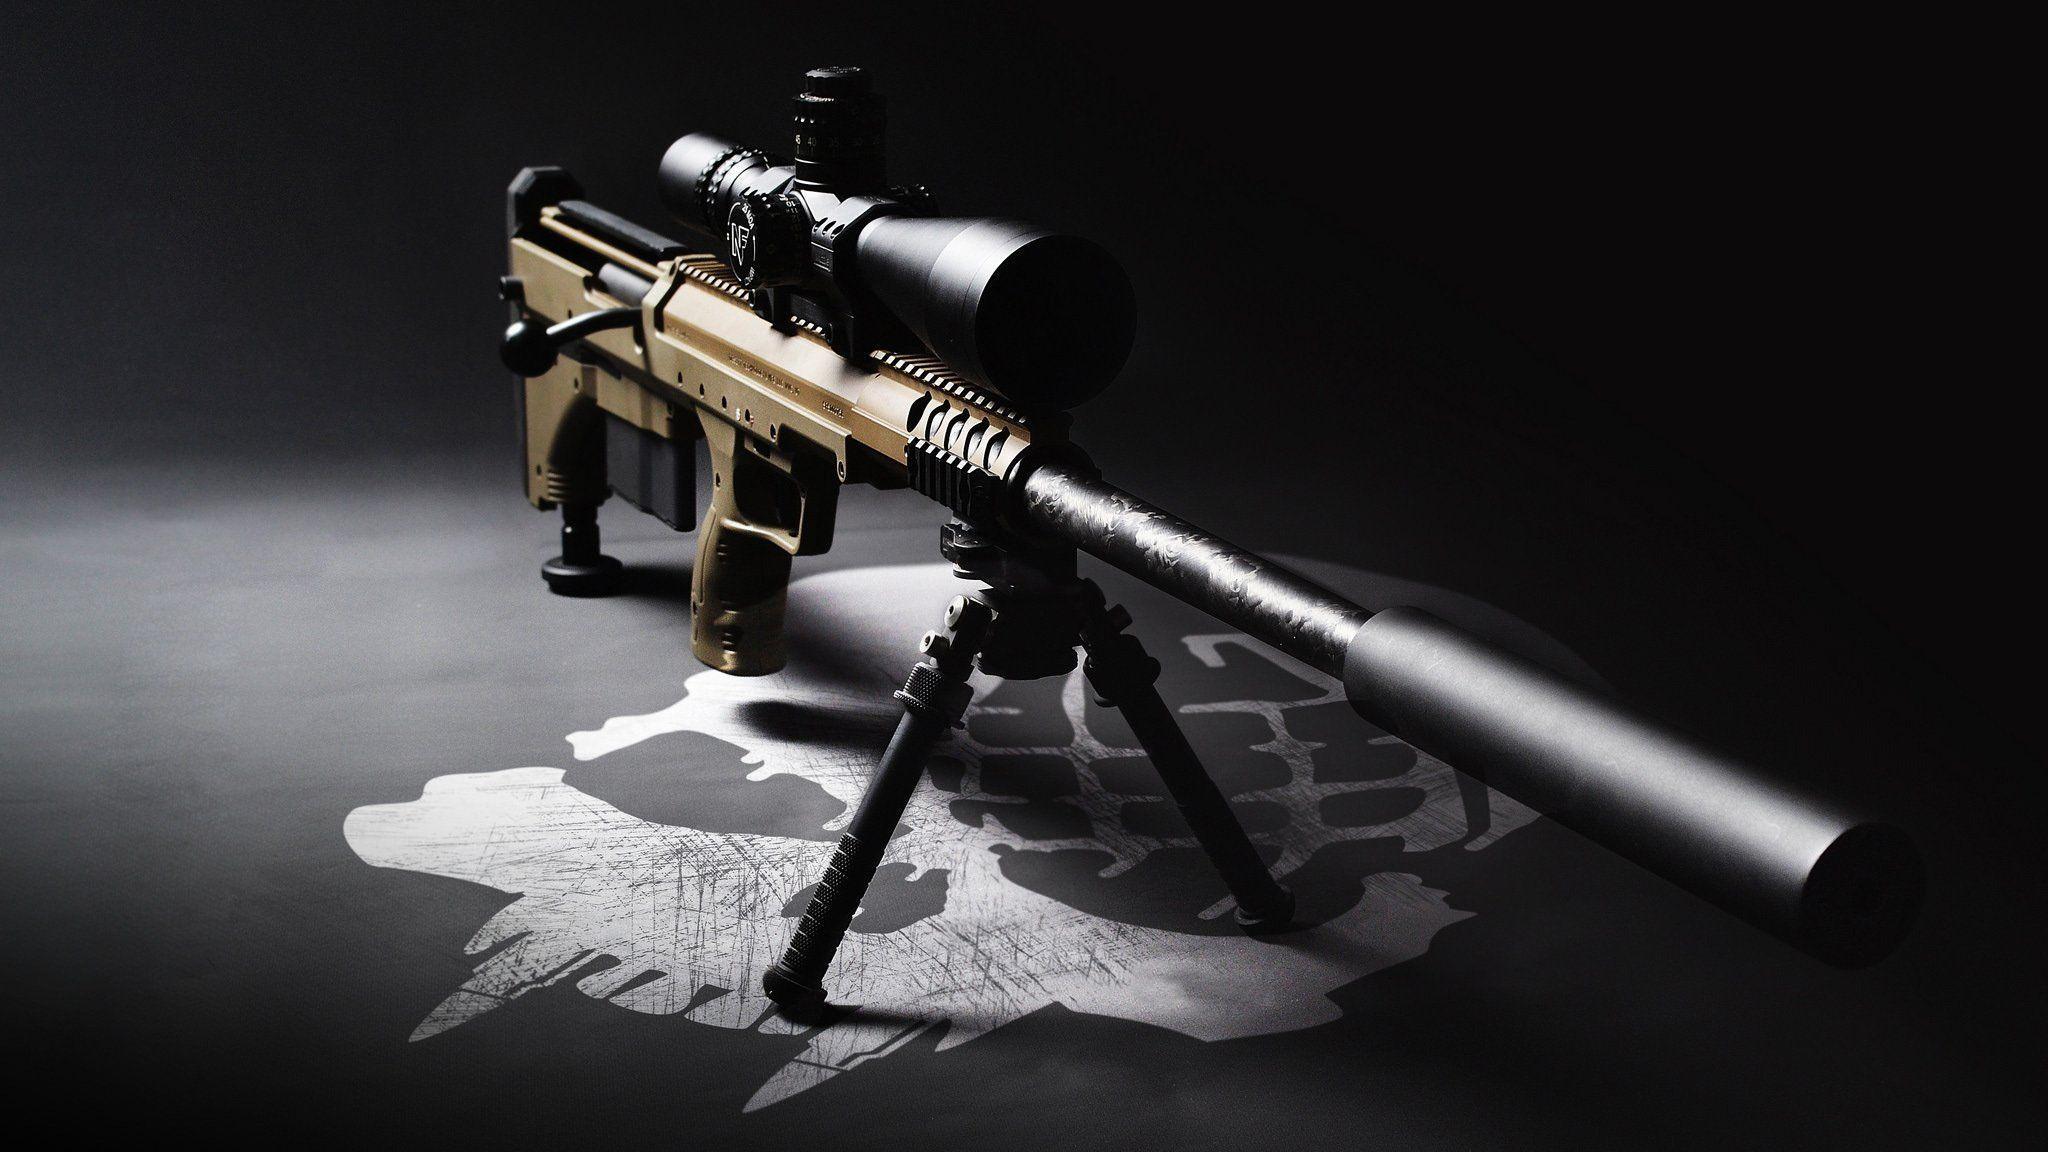 Sniper Rifle Wallpaper HD (79+ images) |Sniper Rifle Wallpaper